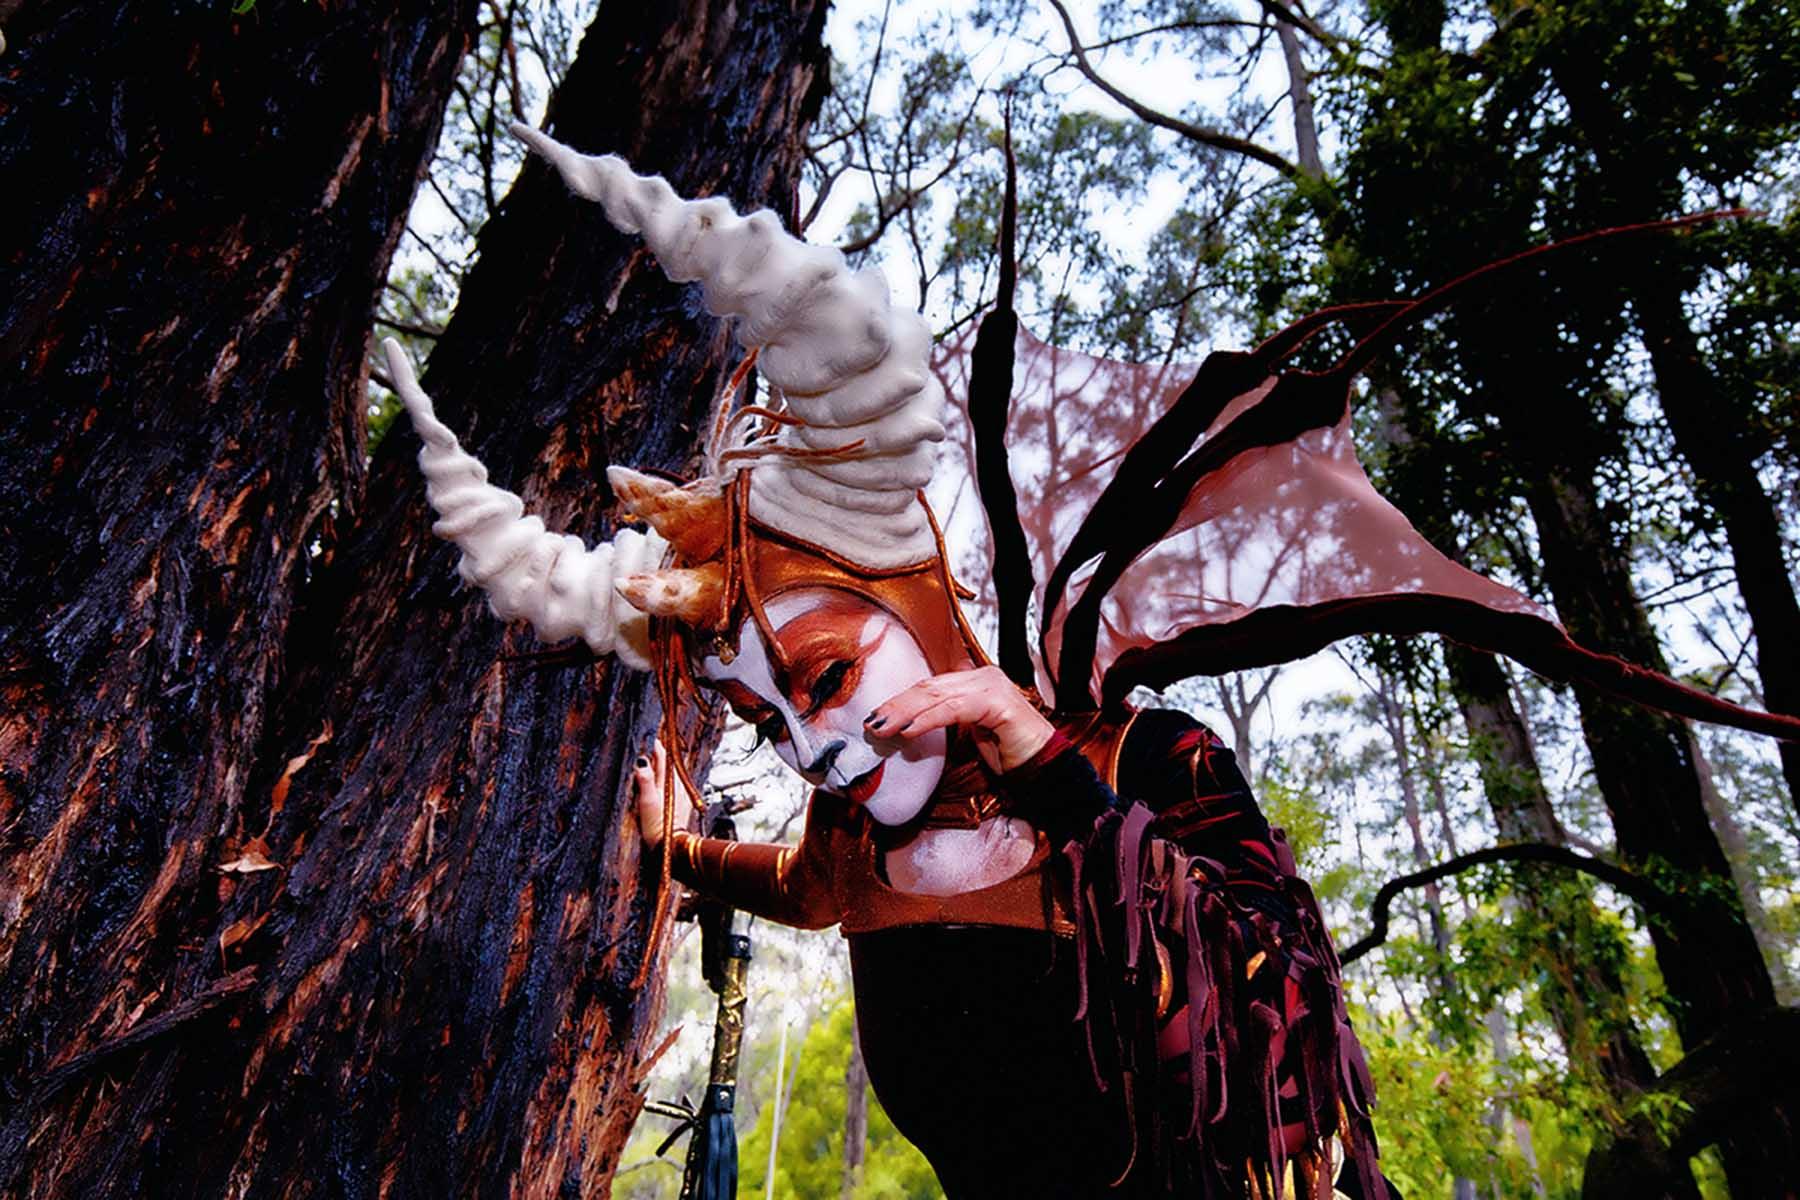 The Chimera & the Wishing Tree - Pop Up Installation, Street Walk, and Live Stream